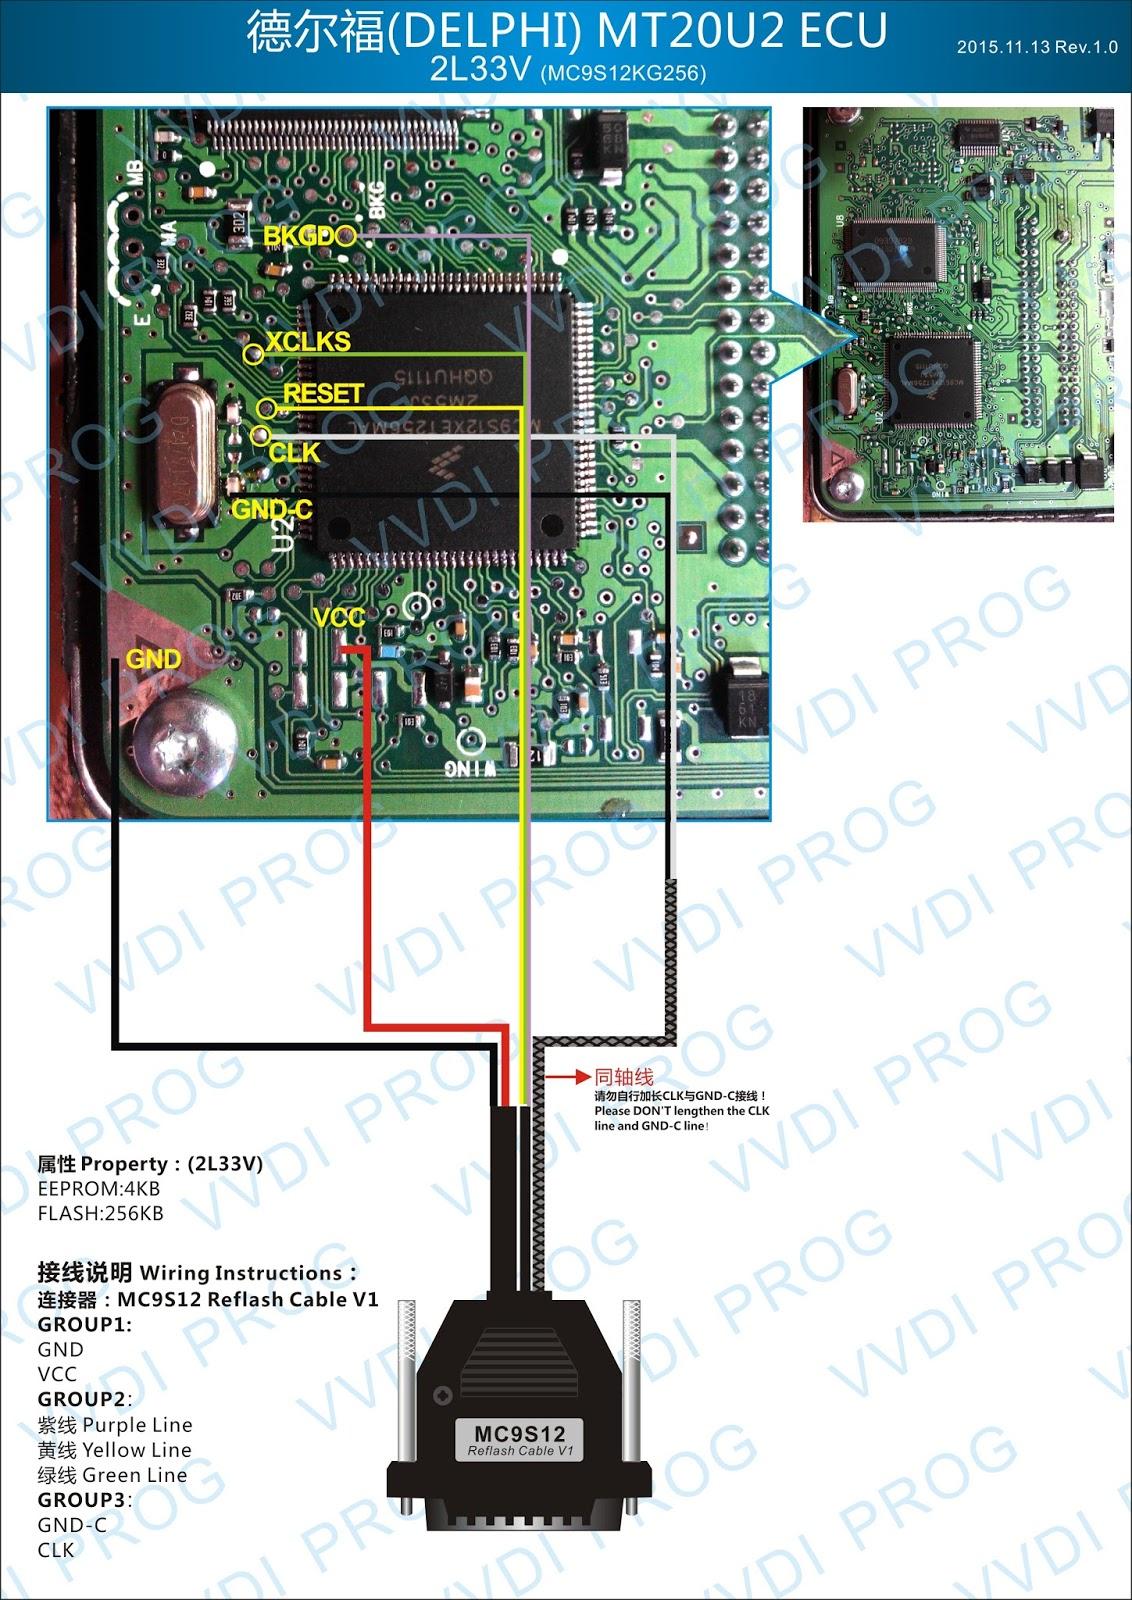 Delphi Ecu Wiring Diagram Free For You Pri Xhorse Vvdi Prog To Ecus Mcus Updating Corolla 4age Pinout